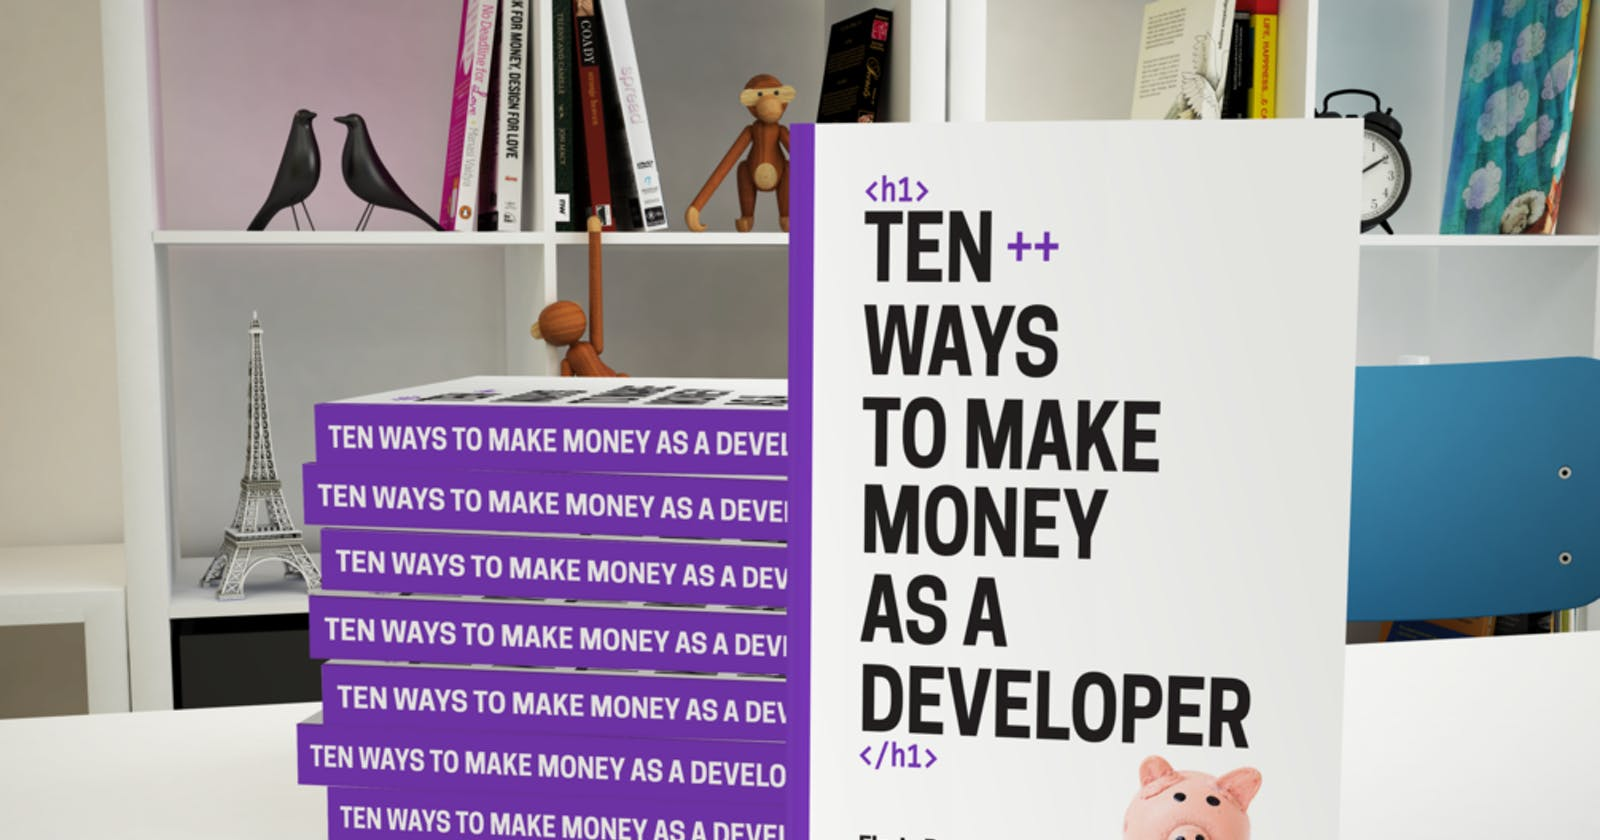 Ten++ Ways To Make Money As A Developer By Florin Pop